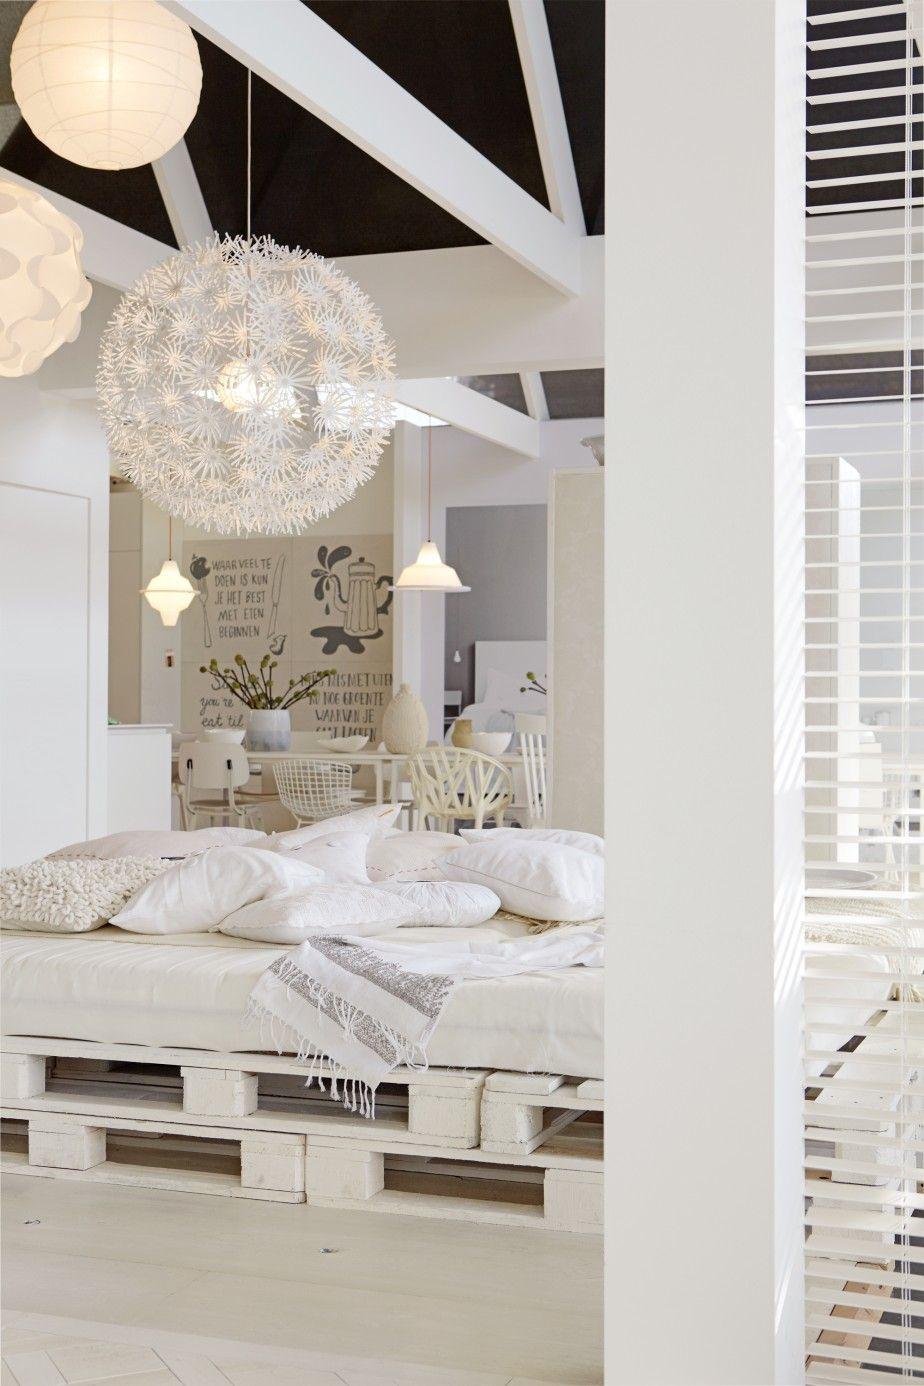 Diy Inspiration Daybeds: Inspiration# Home# ️